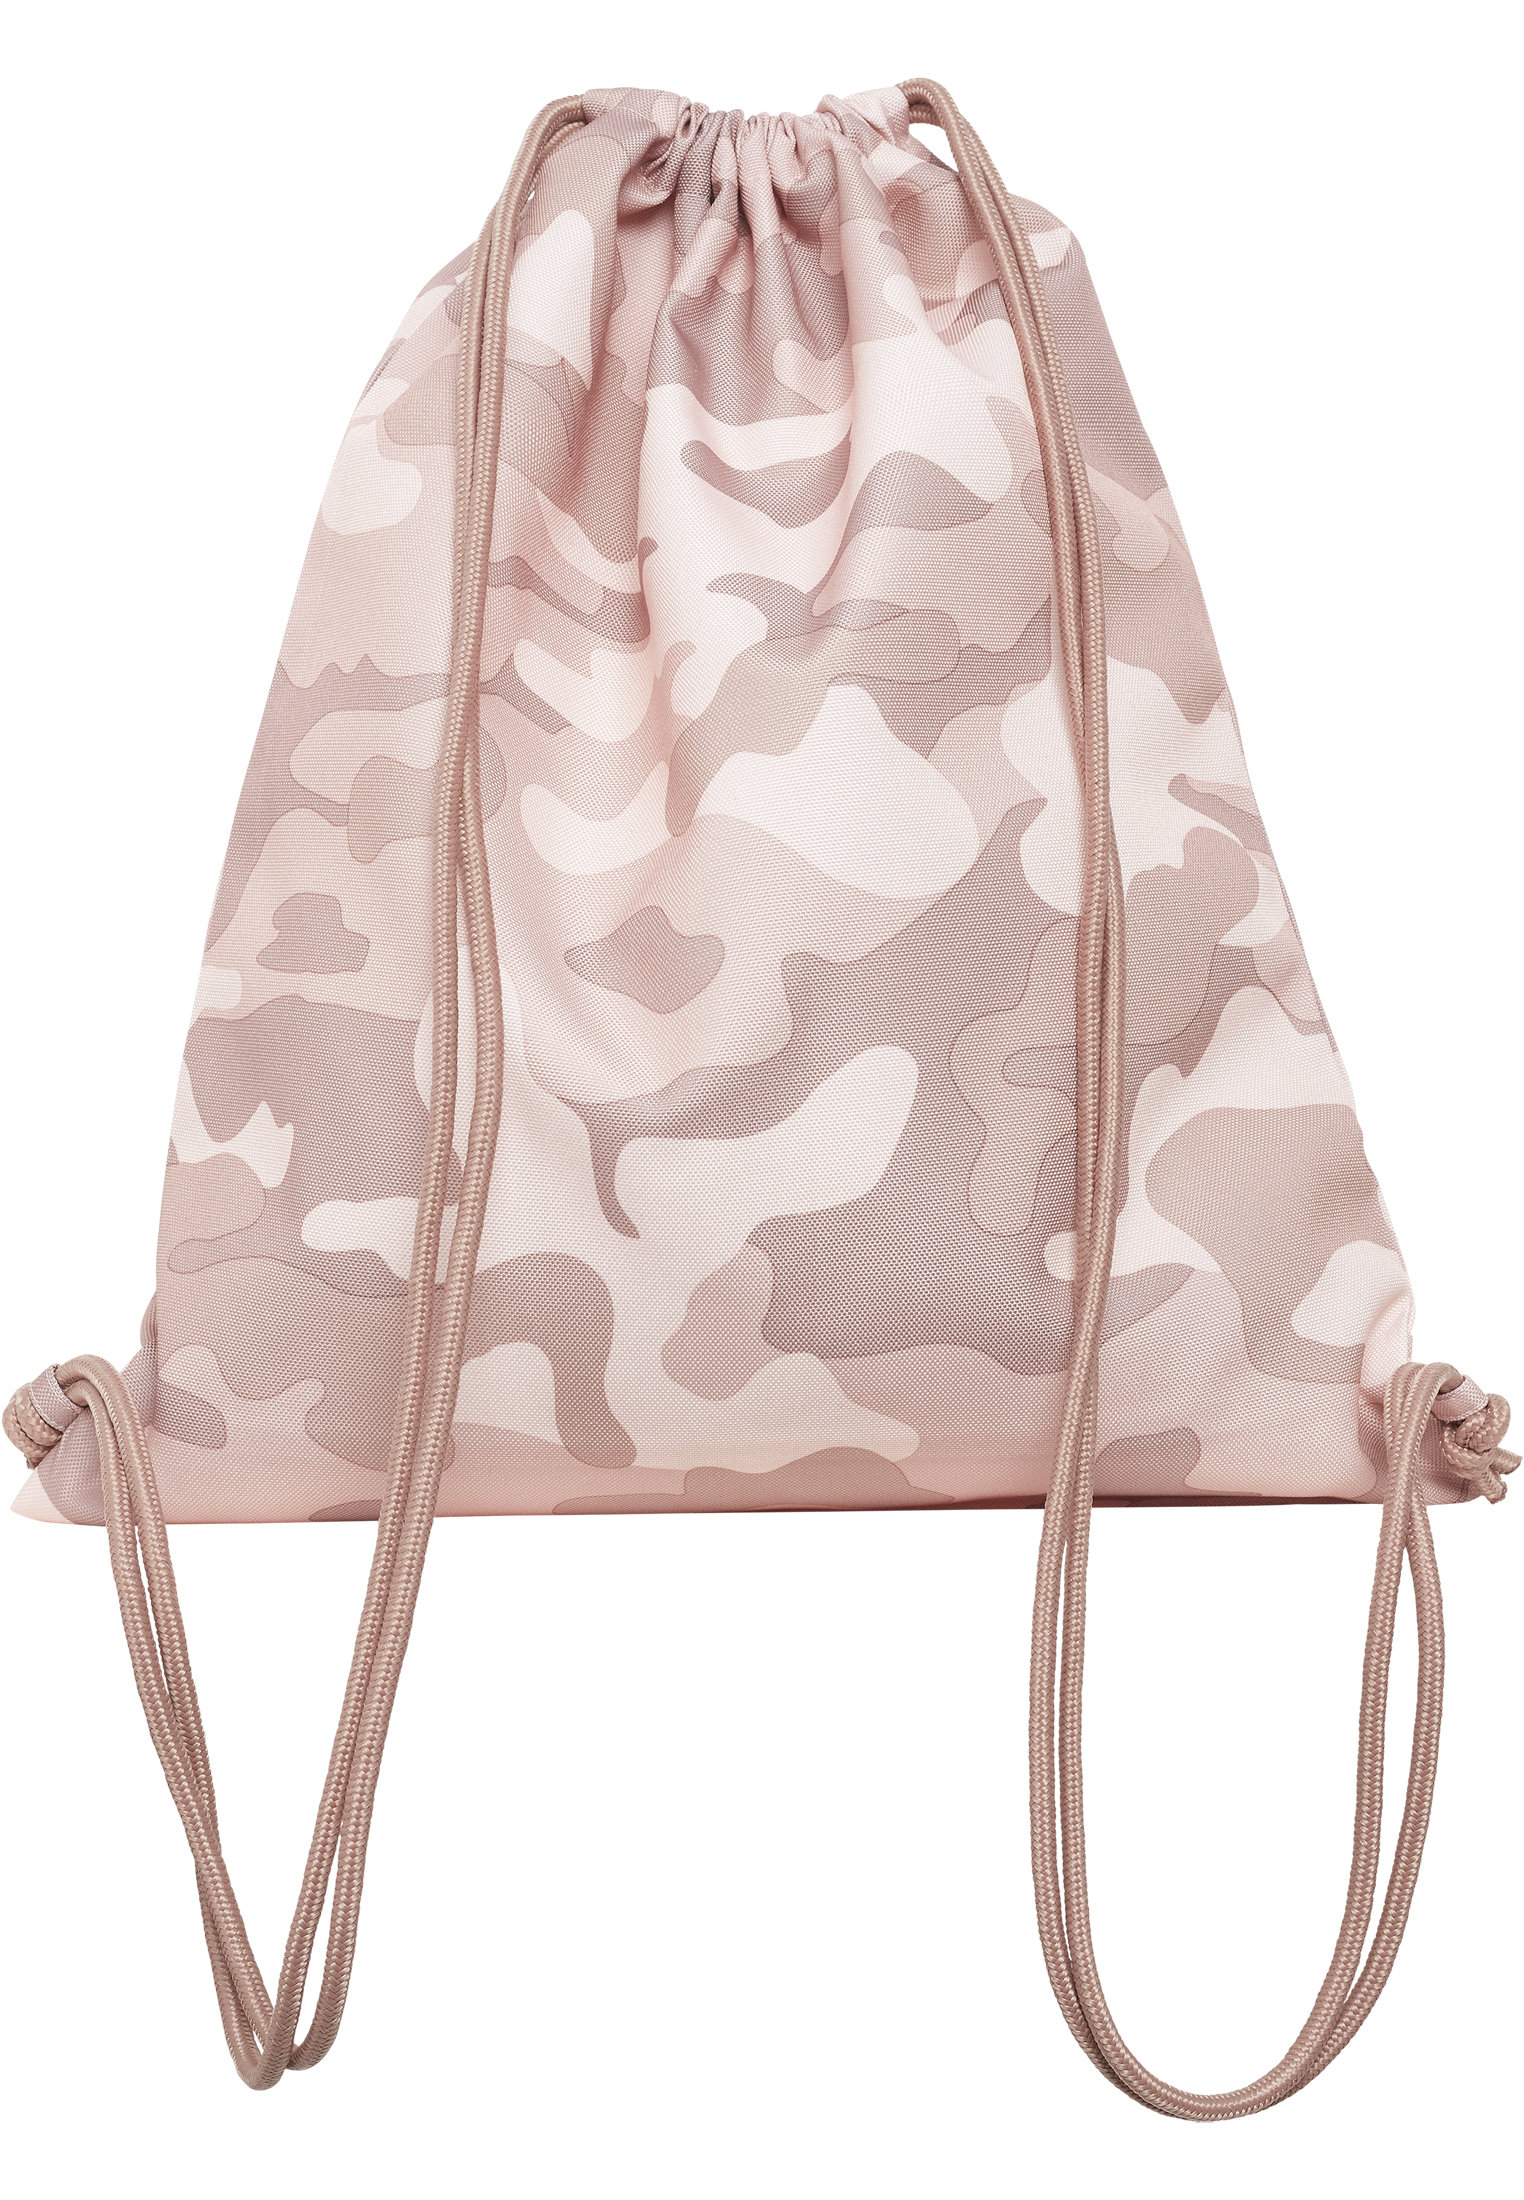 Sac à dos camouflage rose URBAN CLASSICS